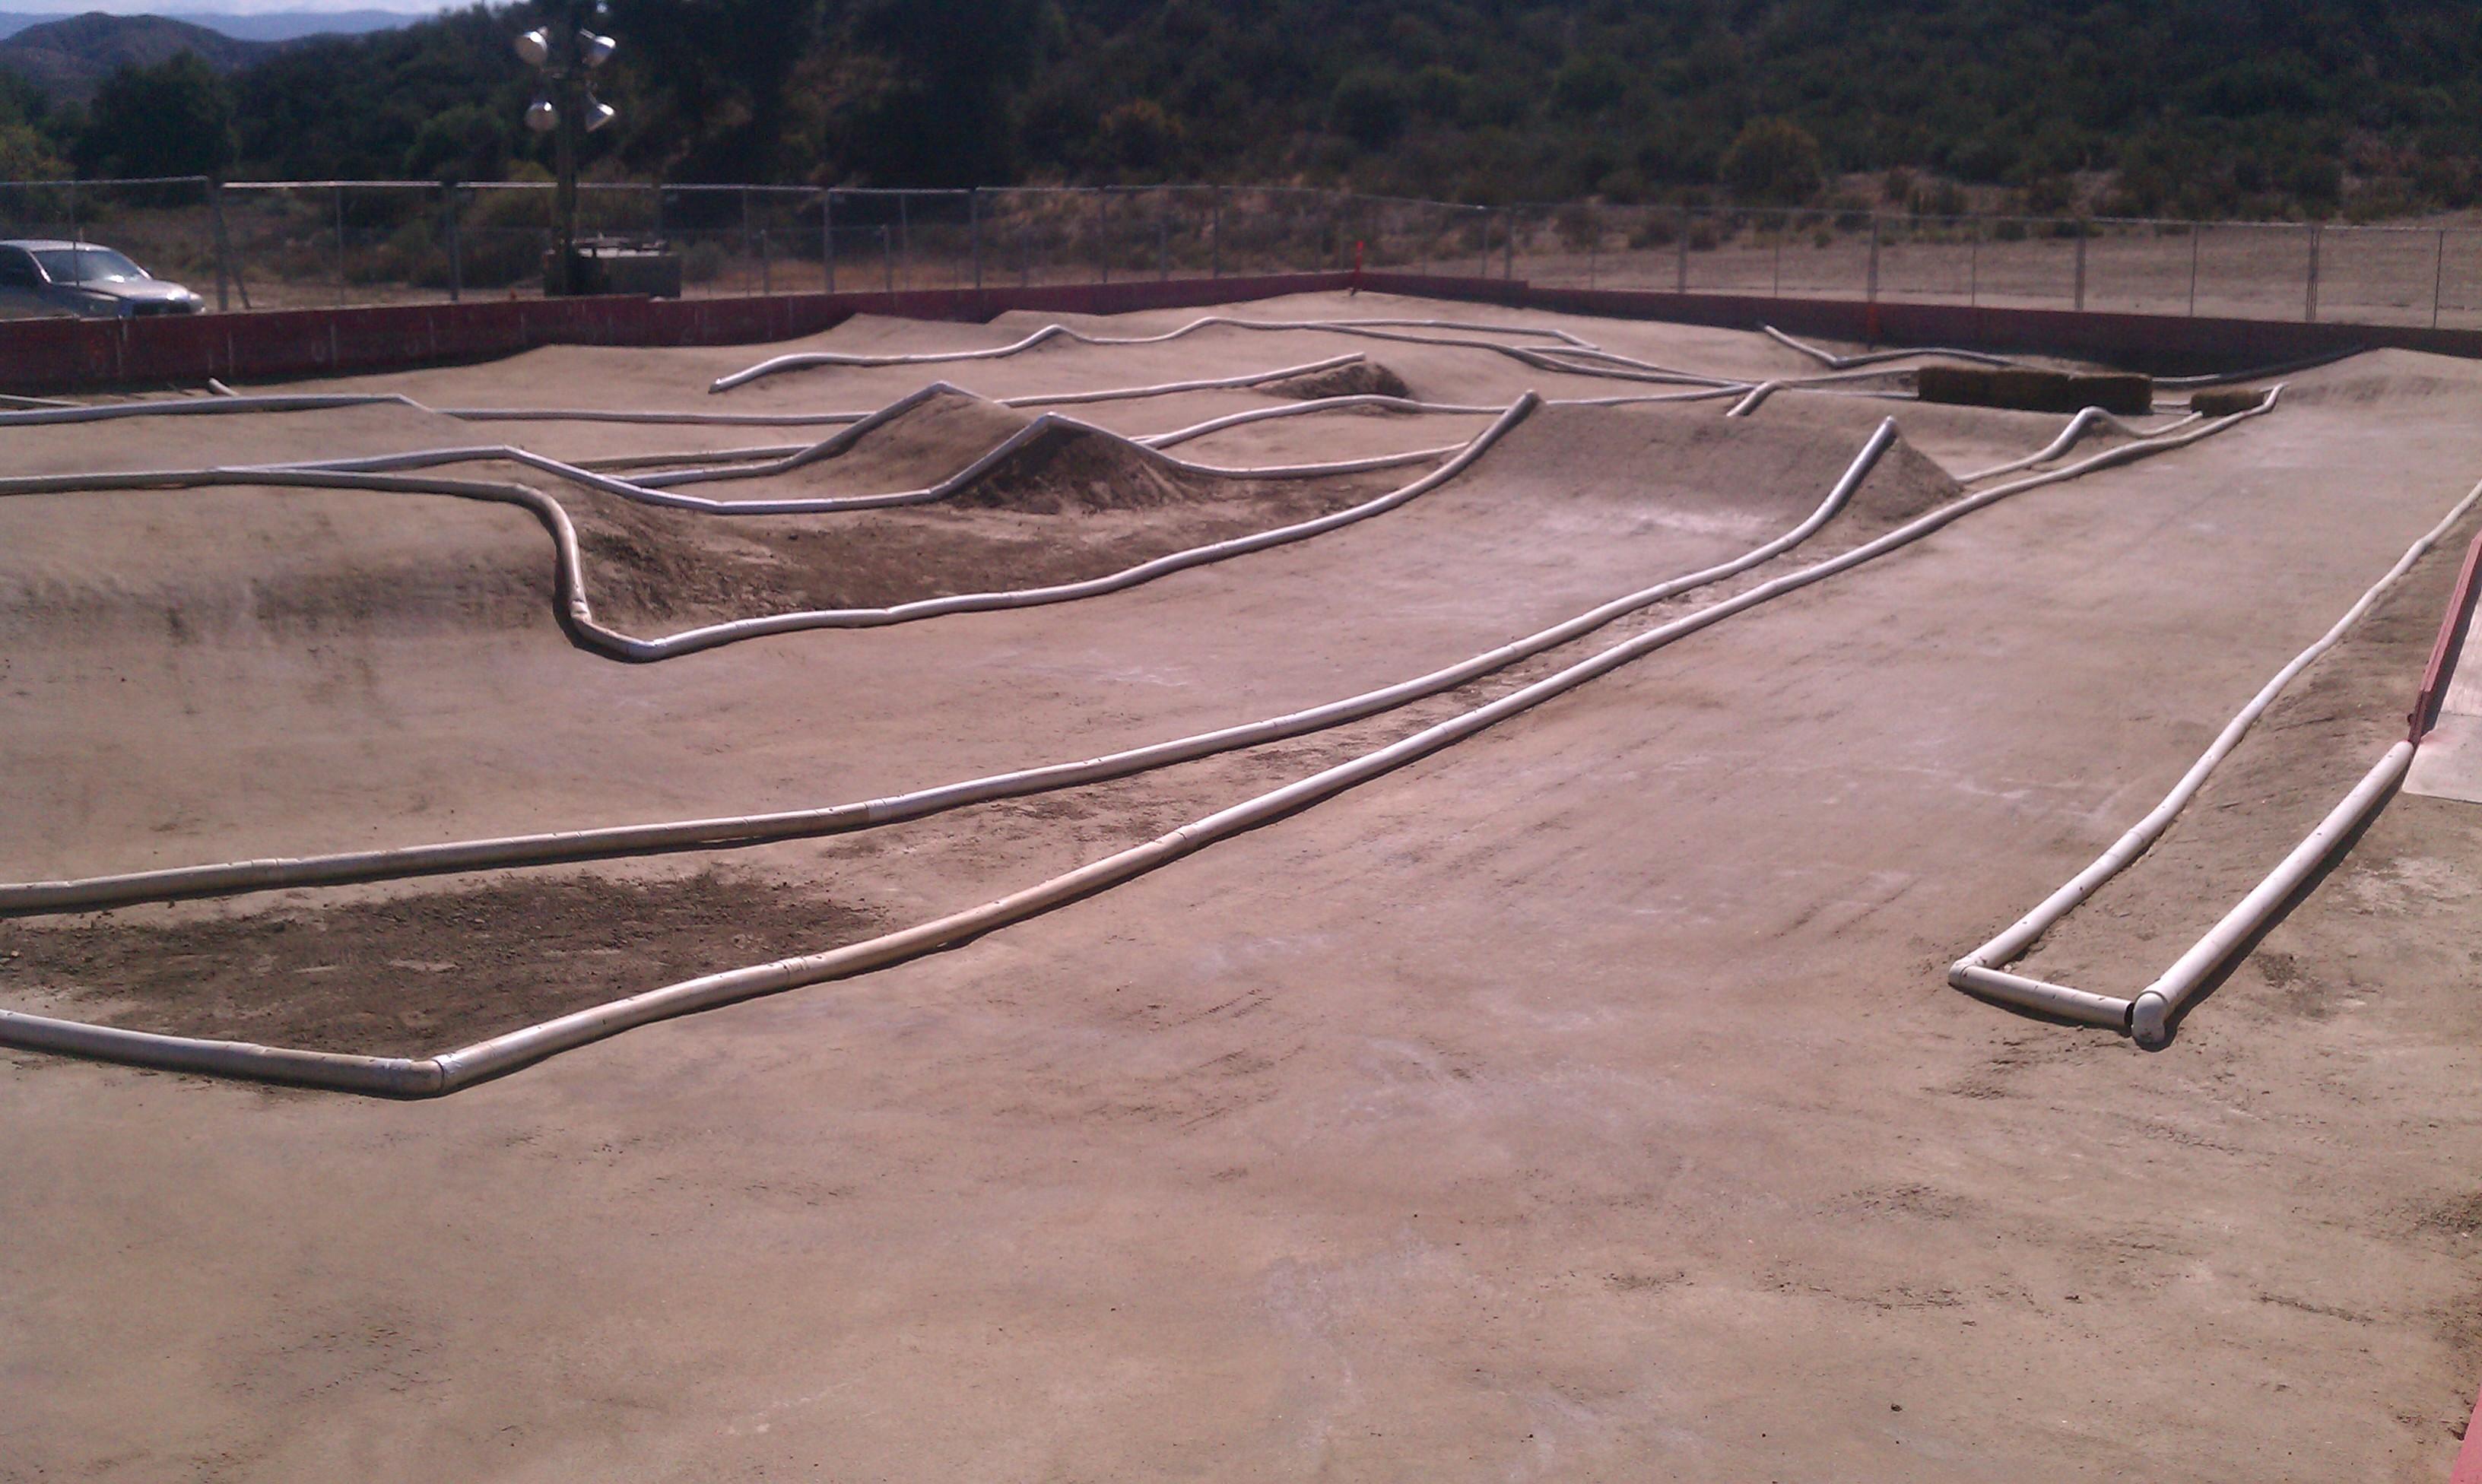 ARC Raceway